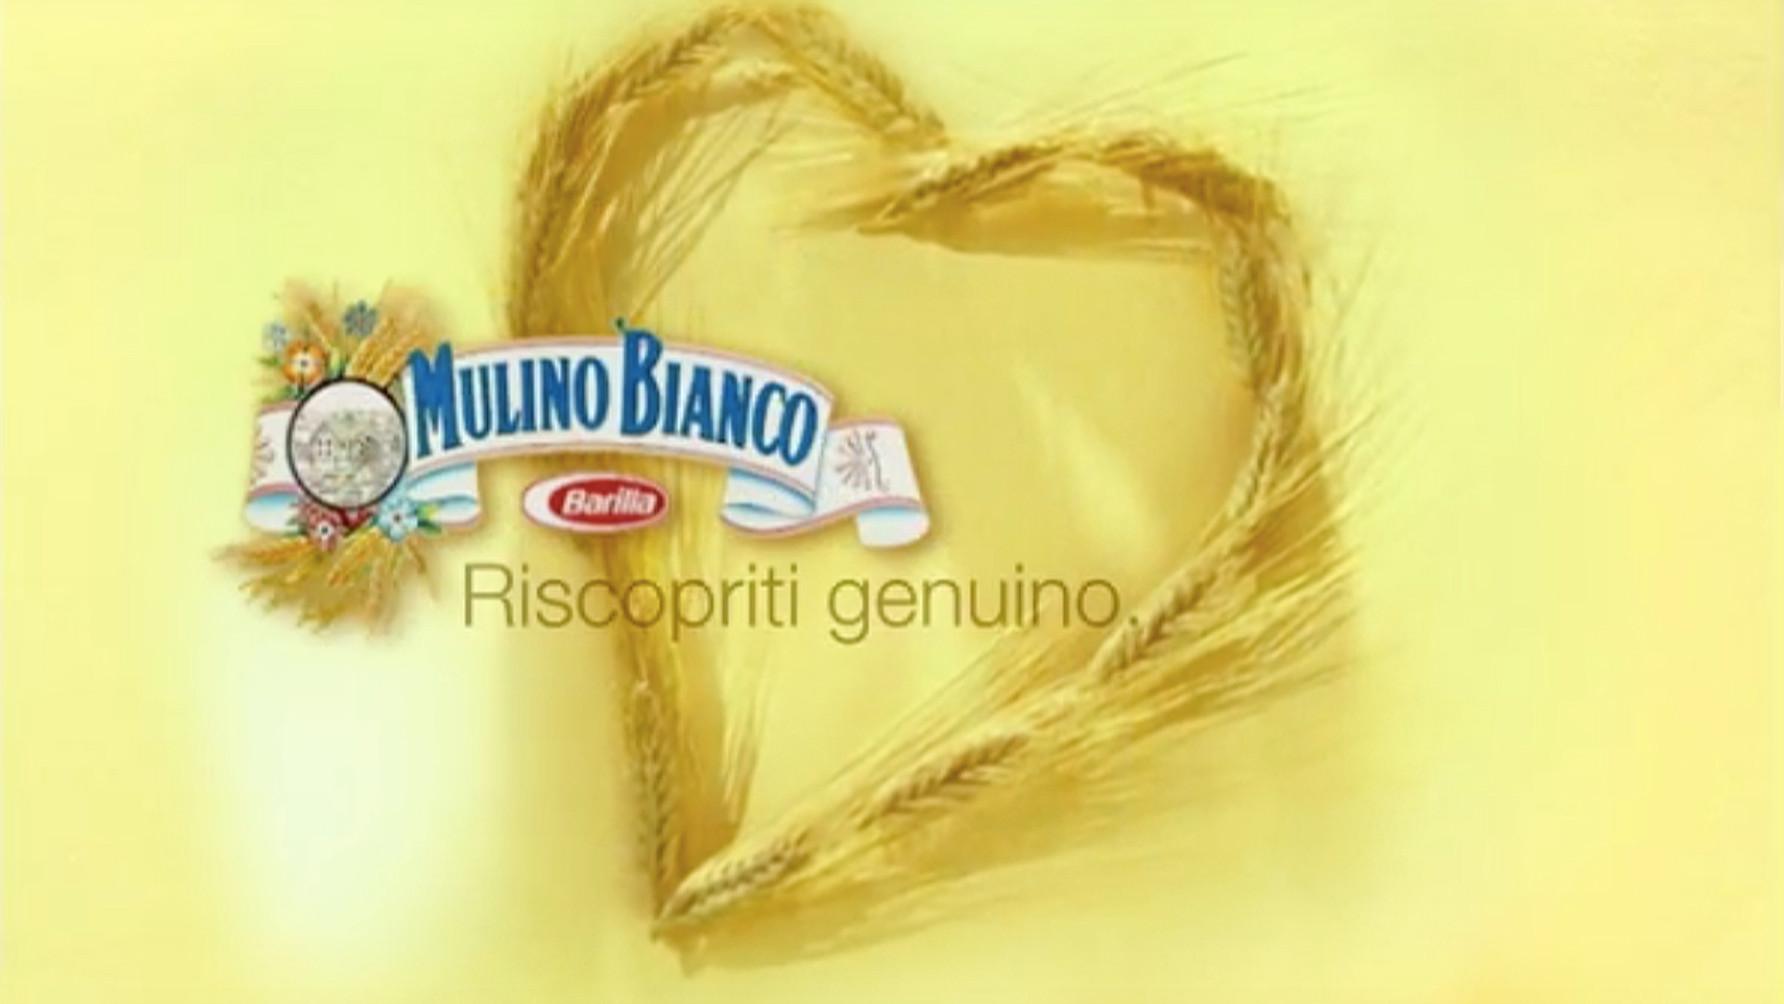 MULINO BIANCO Director Peter Maguire